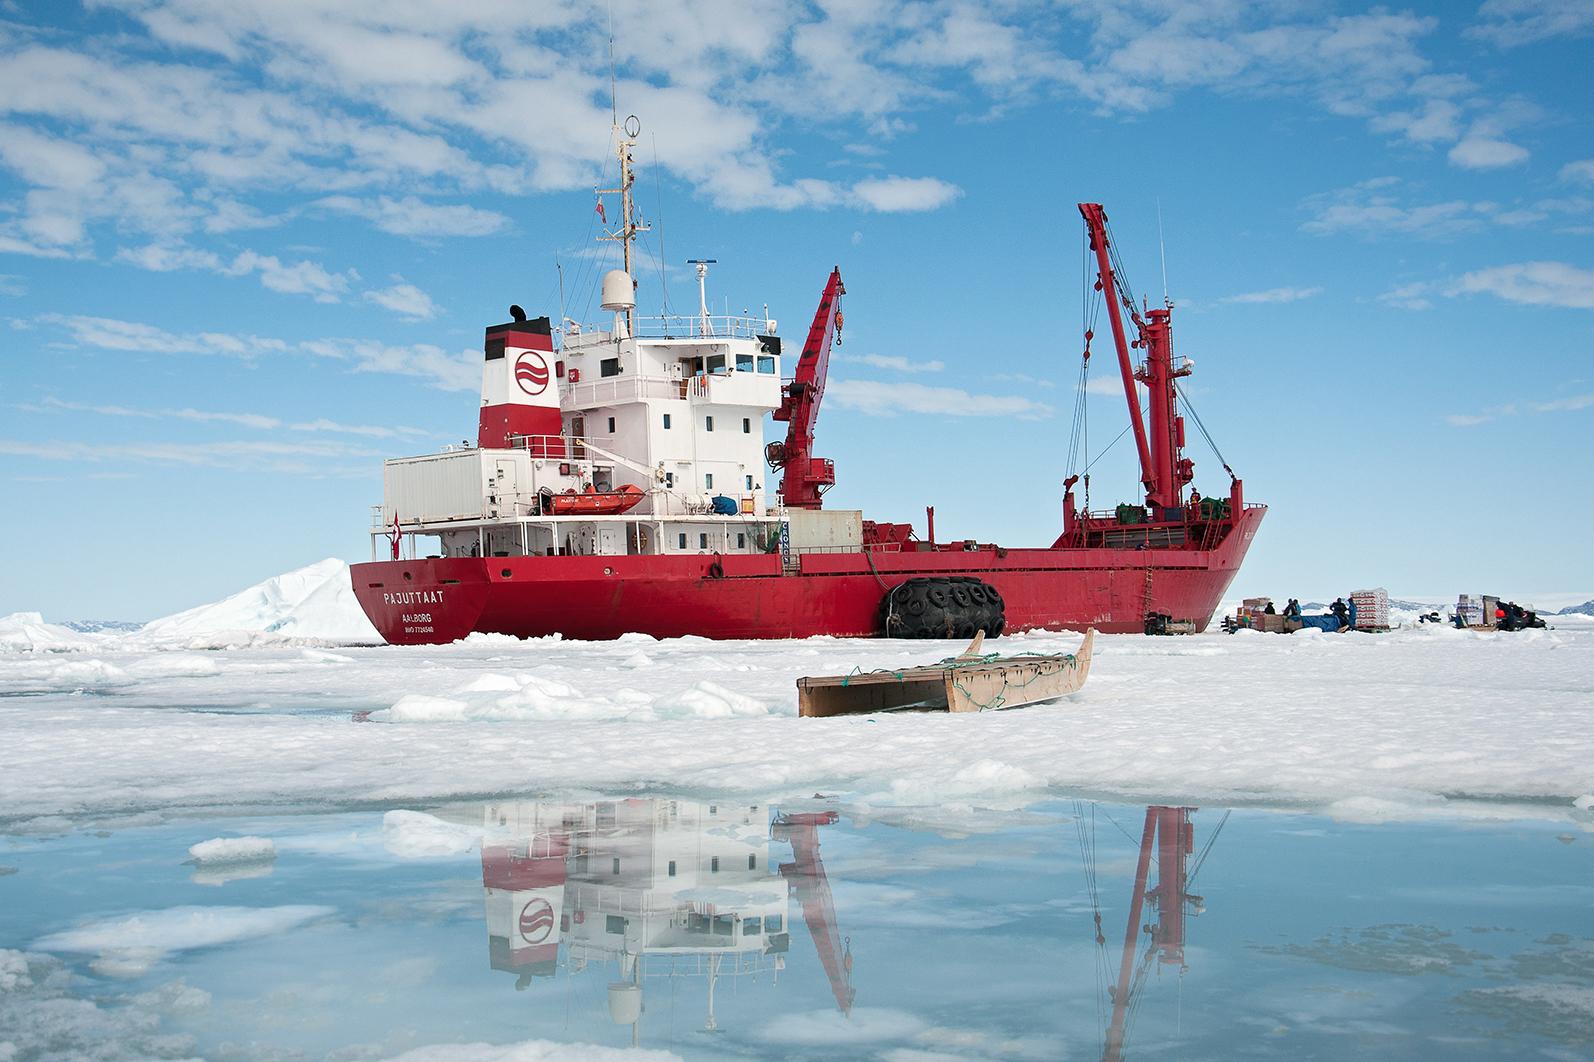 Arctic Line : Pajuttaat royal arctic line